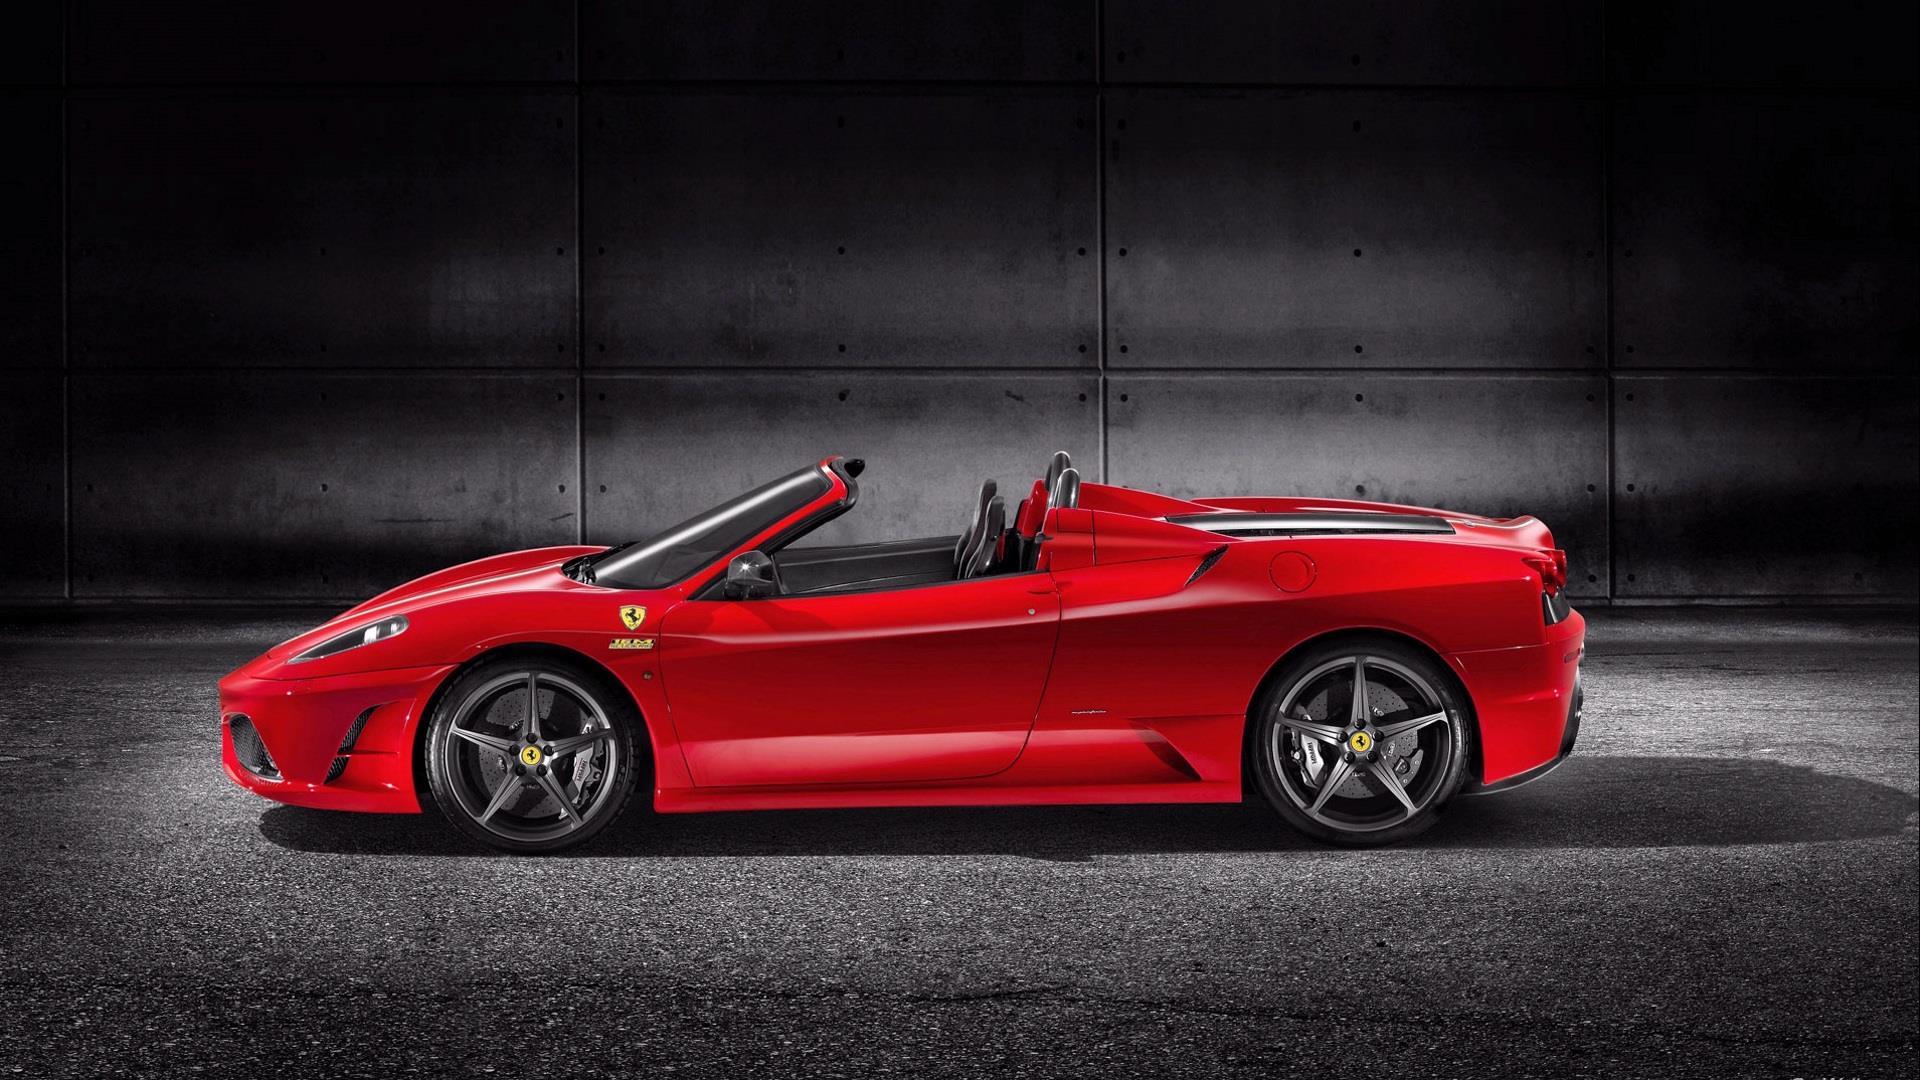 rouge-ferrari-automobile-de-luxe-passion_4